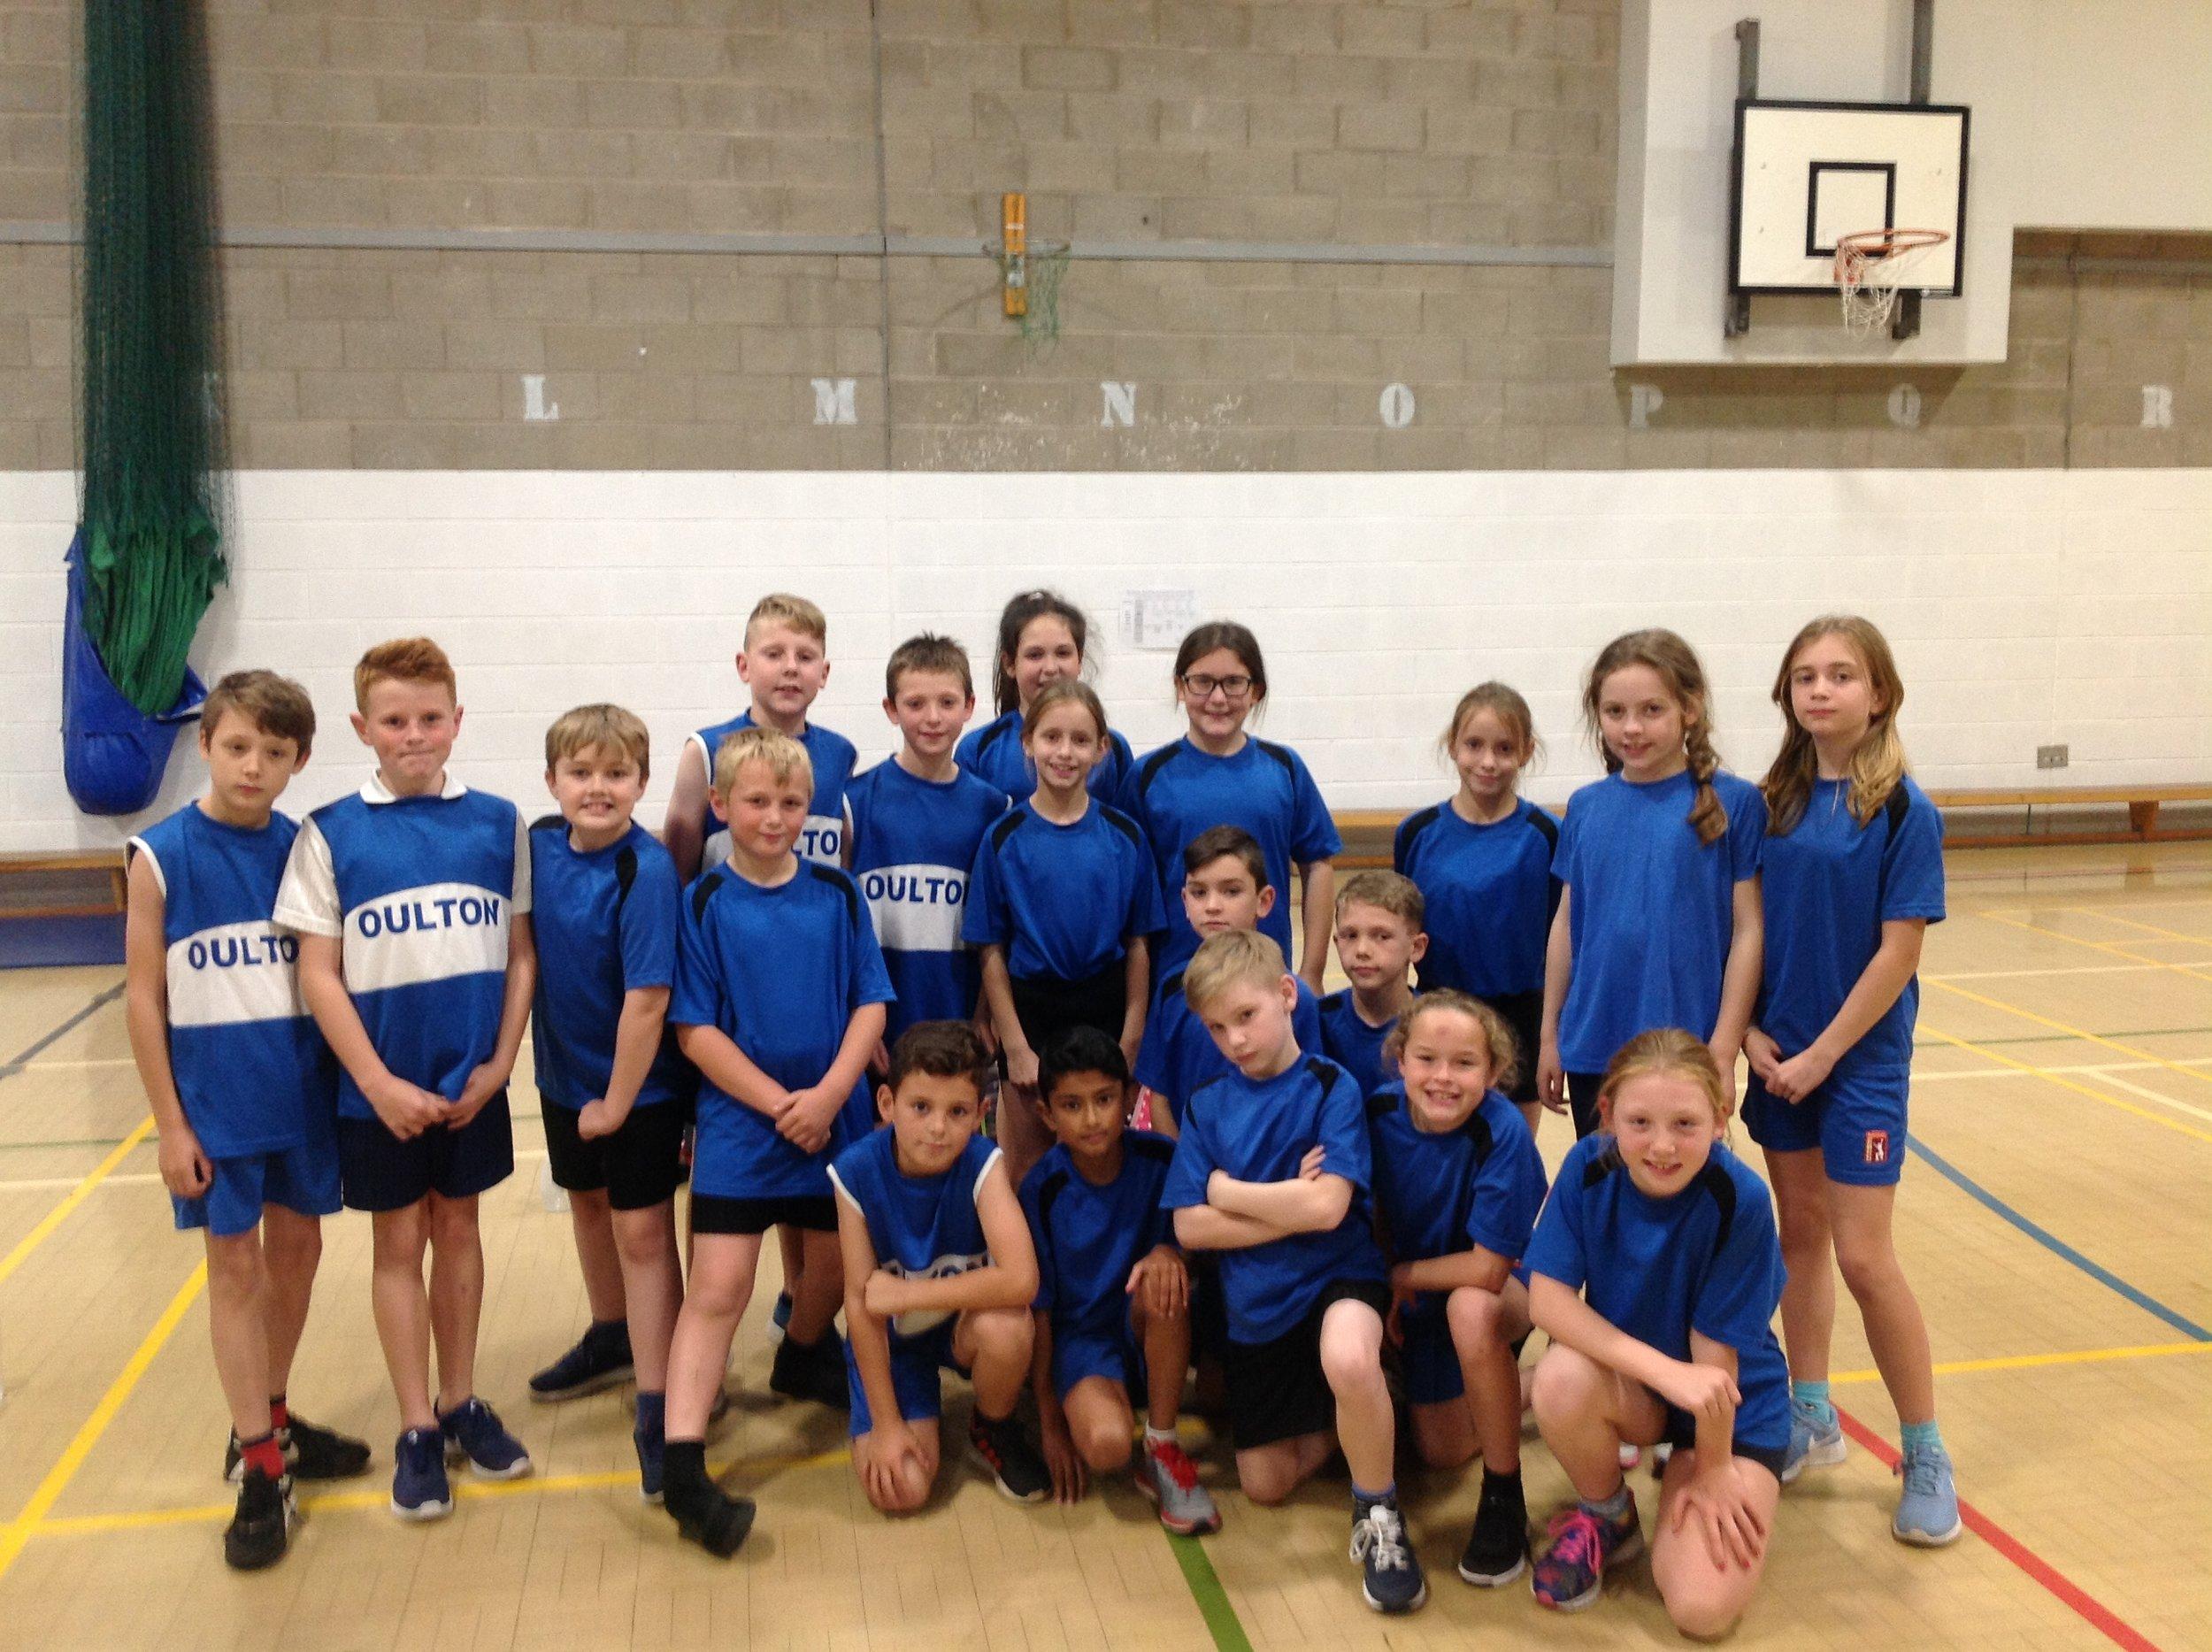 Oulton Primary